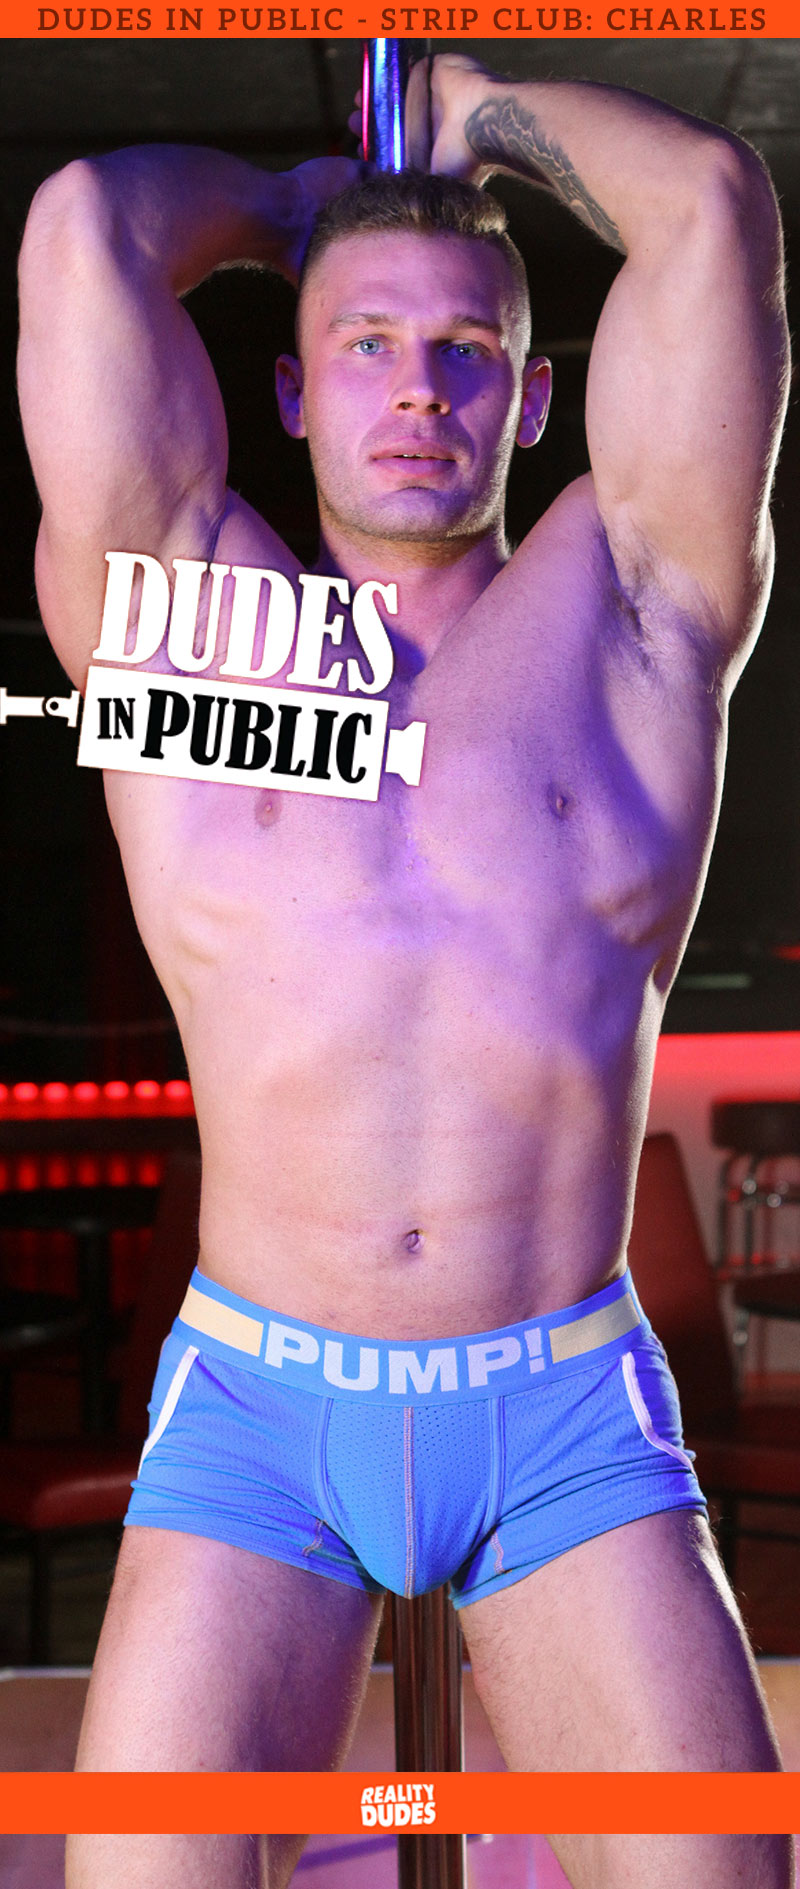 Dudes In Public, Strip Club: Charles